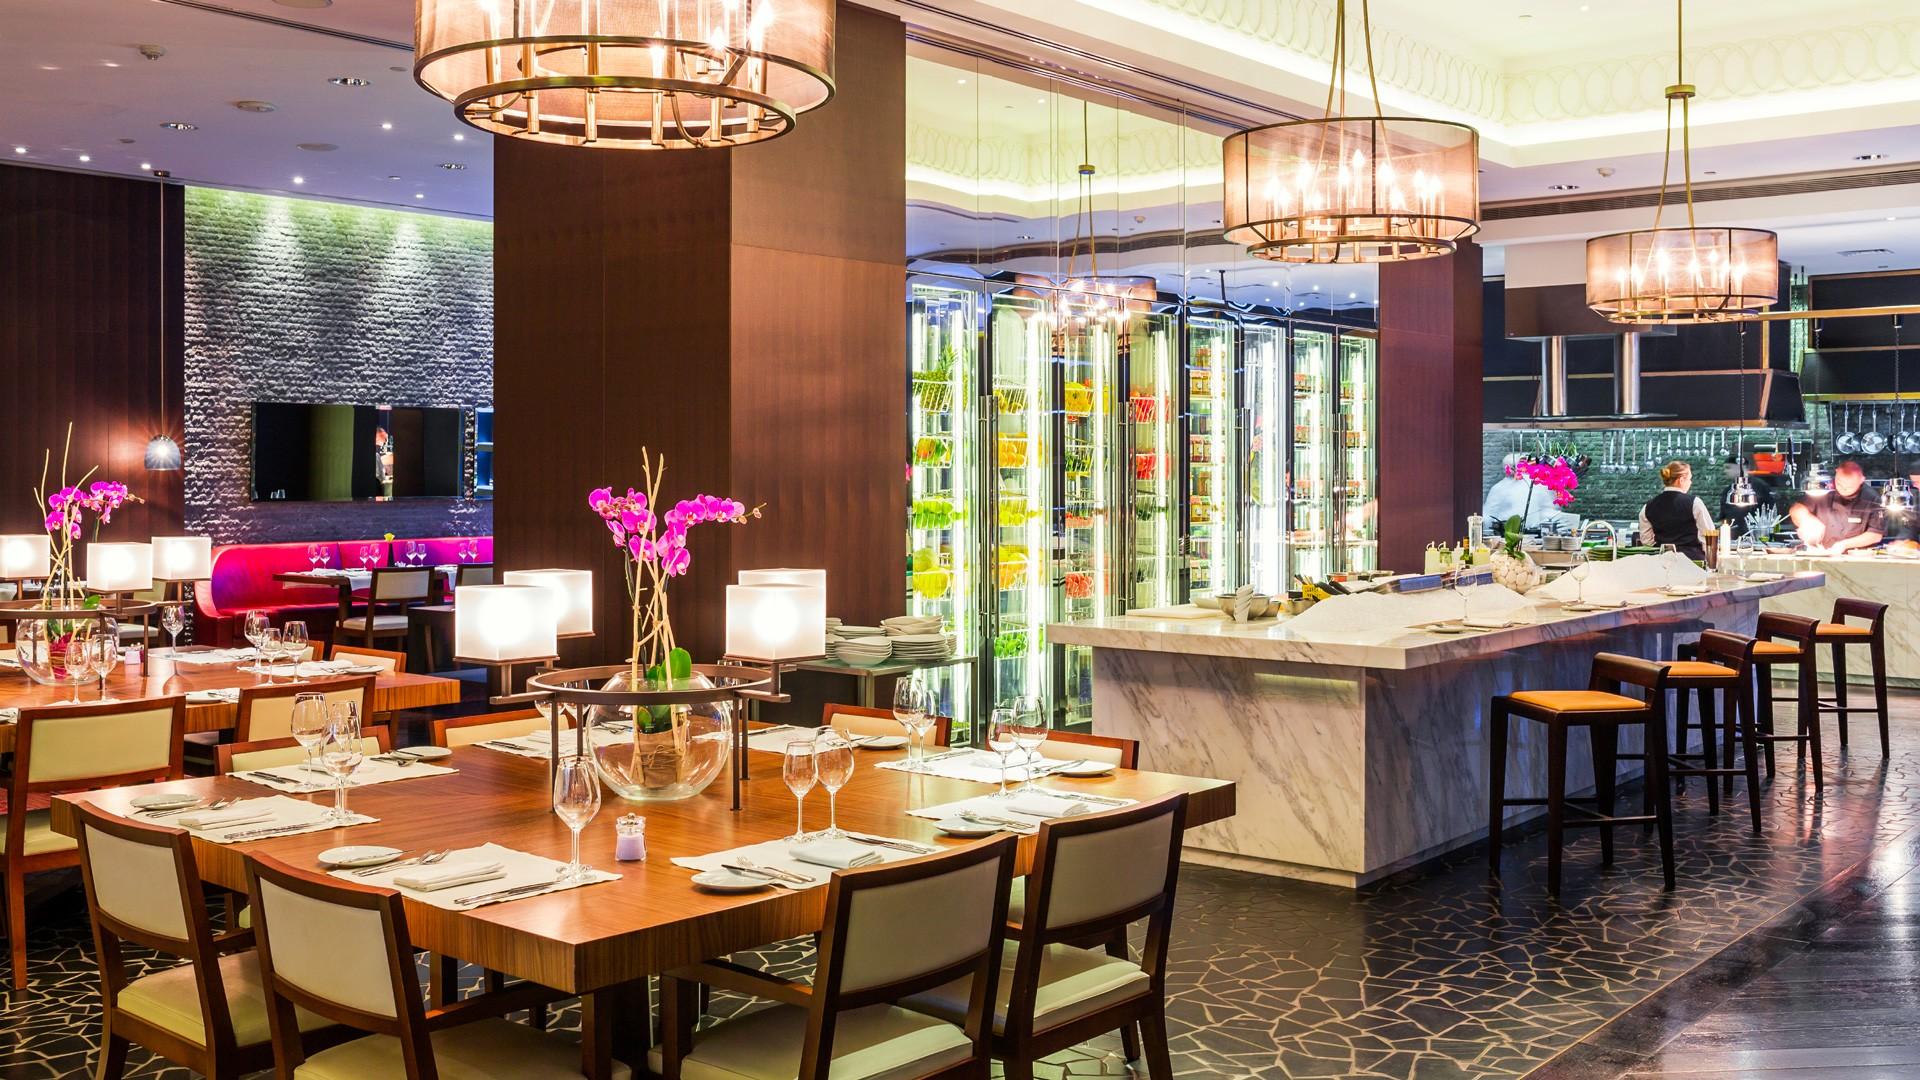 Poliform_contract_hospitality_HILTON_HOTEL_04_1920x1080px